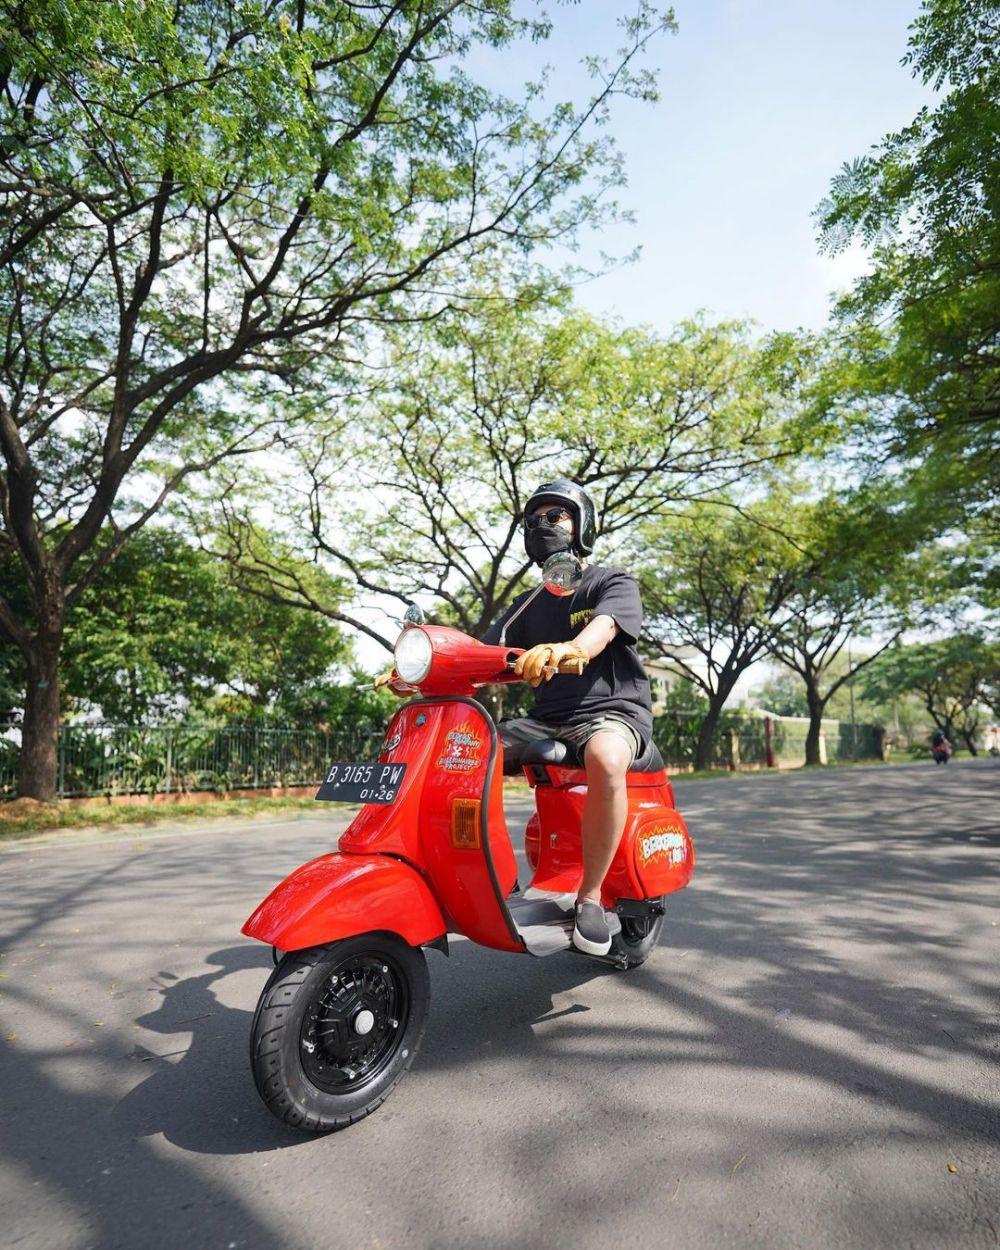 9 Potret Arief Muhammad ketika Menunggangi Motor, Gagah Abis!